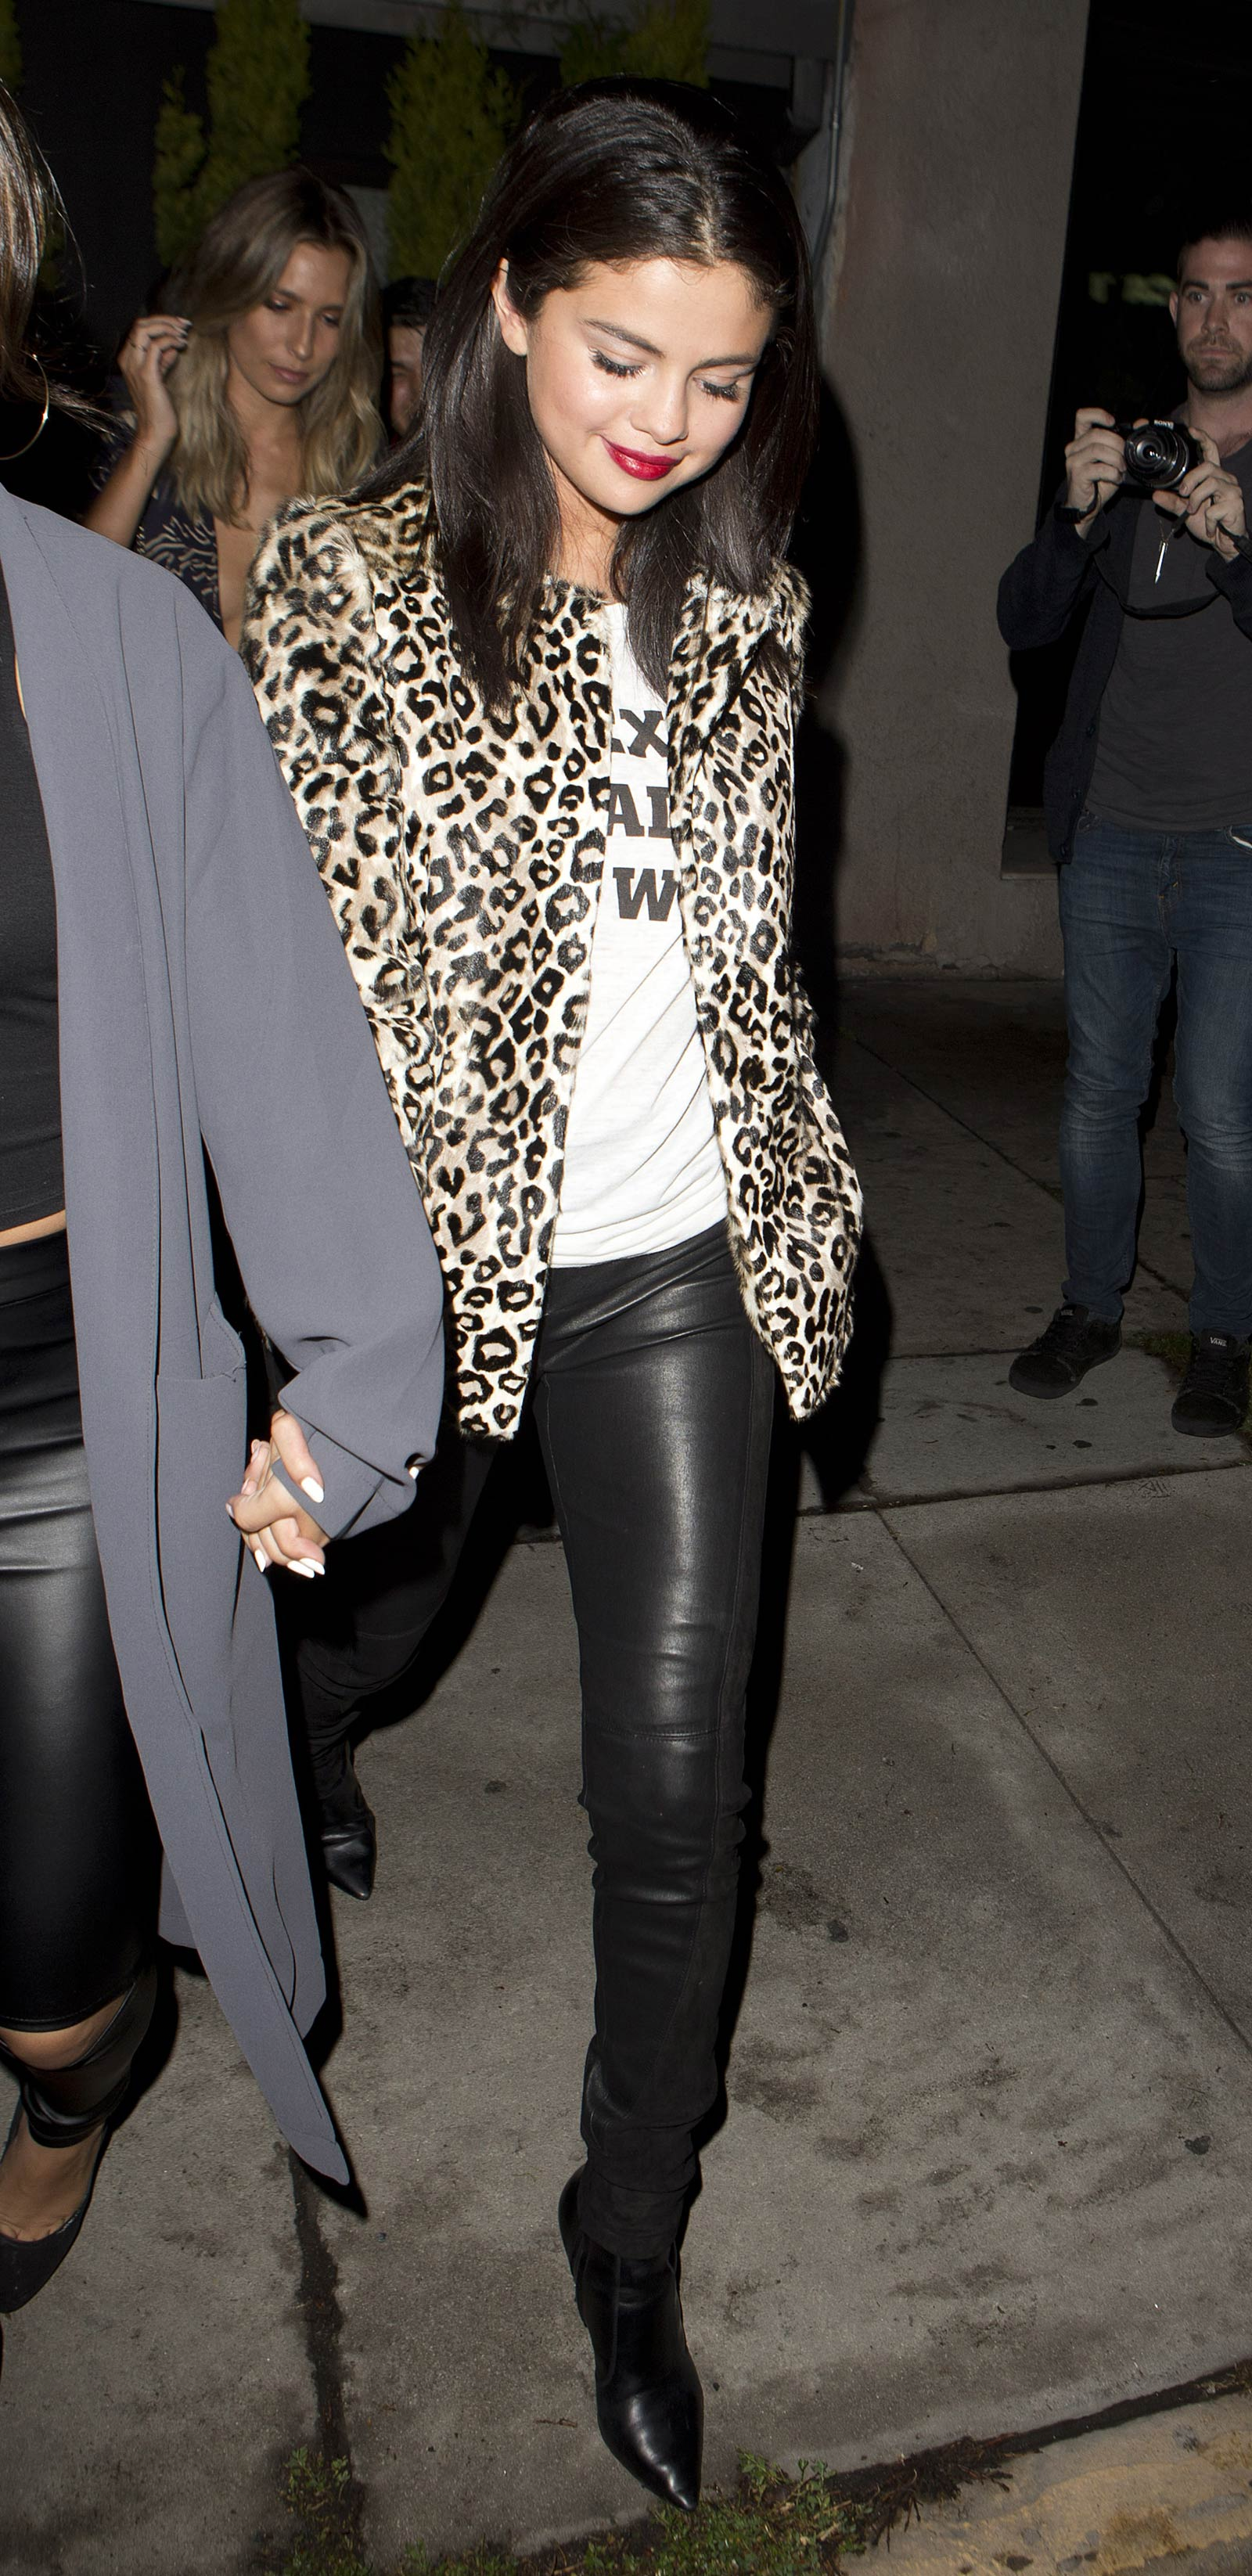 Selena Gomez & Francia Raisa leaving The Nice Guy Restaurant